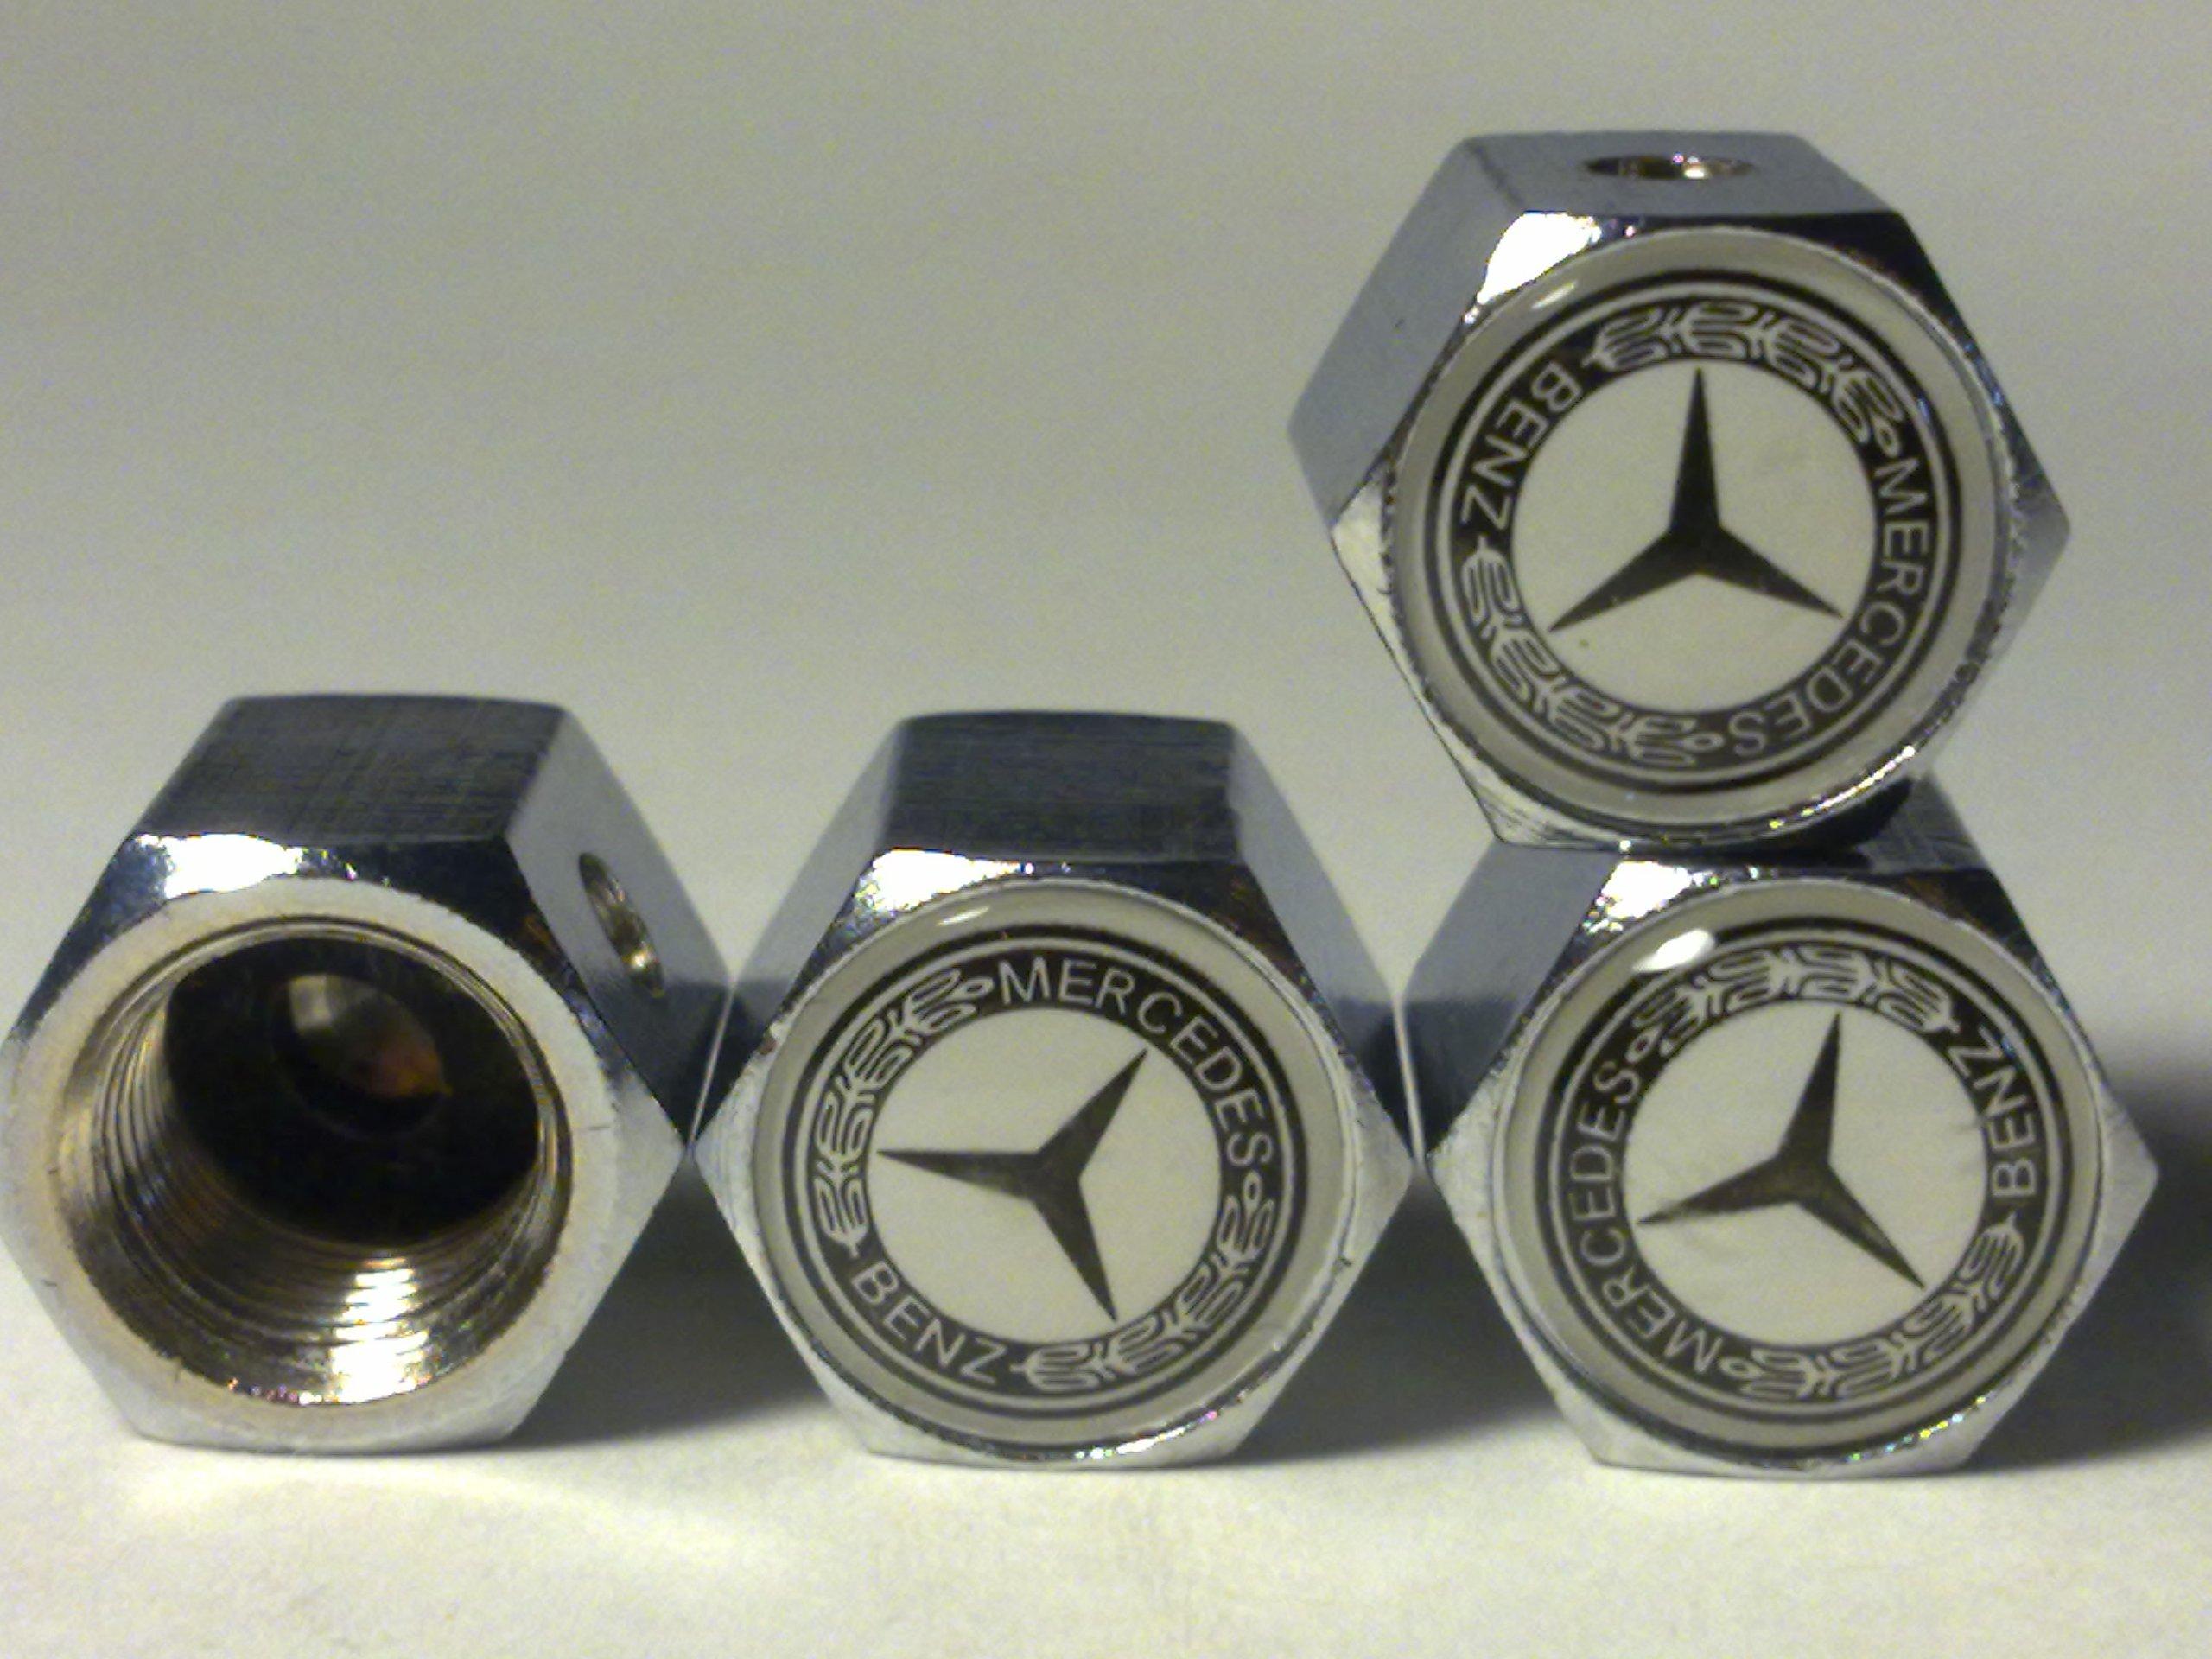 4pcs Carbon Fiber Metal Wheel Tires Air Valve Stems Caps Auto Car Accessories Continental Designed Ford